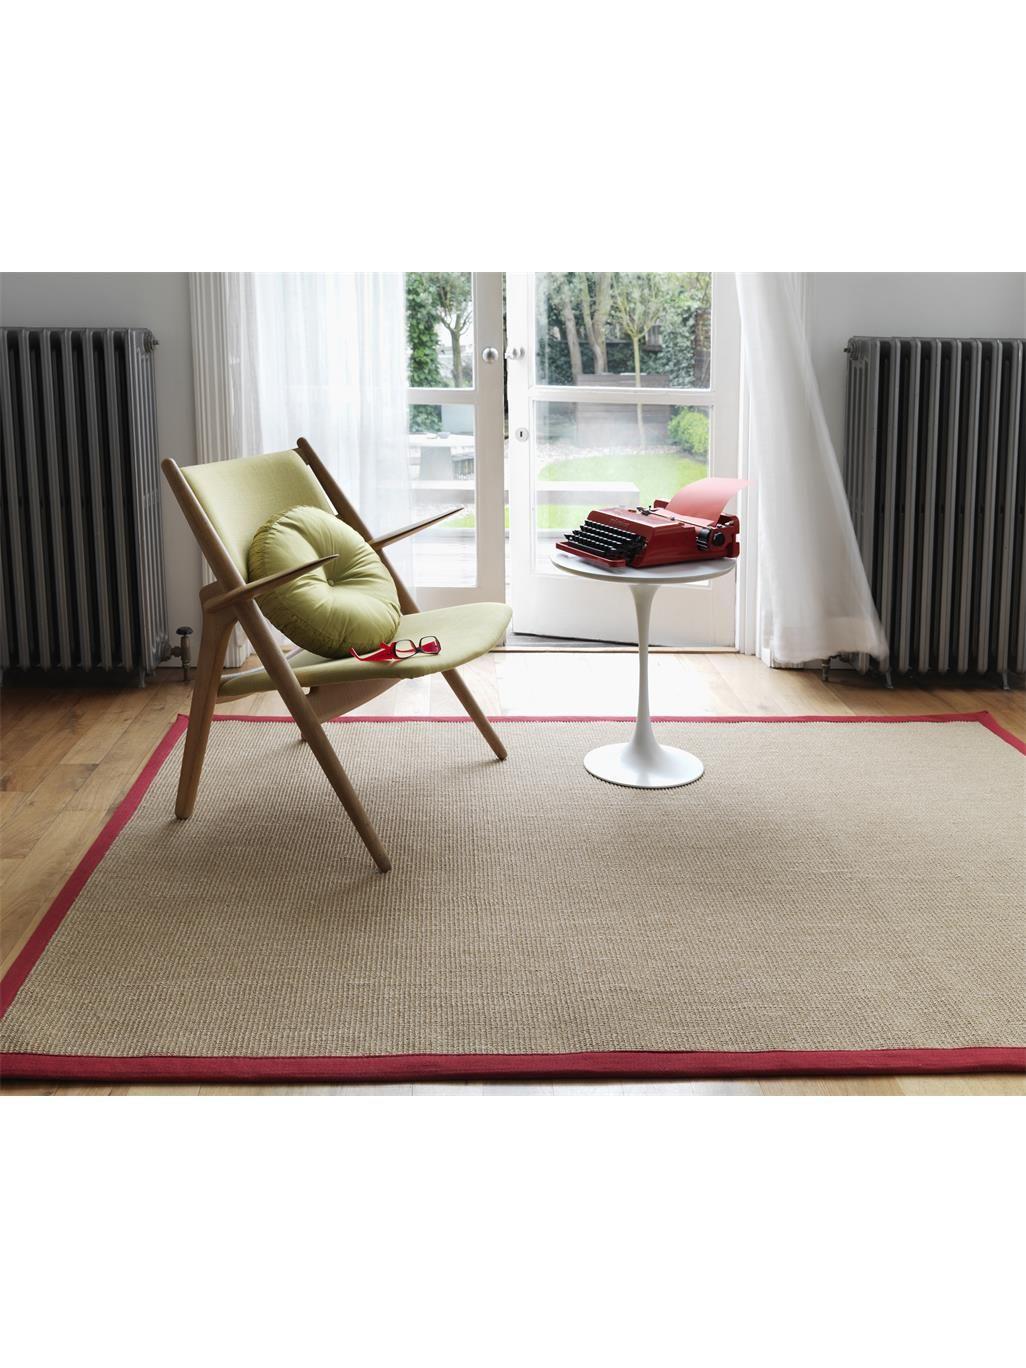 Benuta De http benuta de teppich sisal rot 3 2 html für mehr